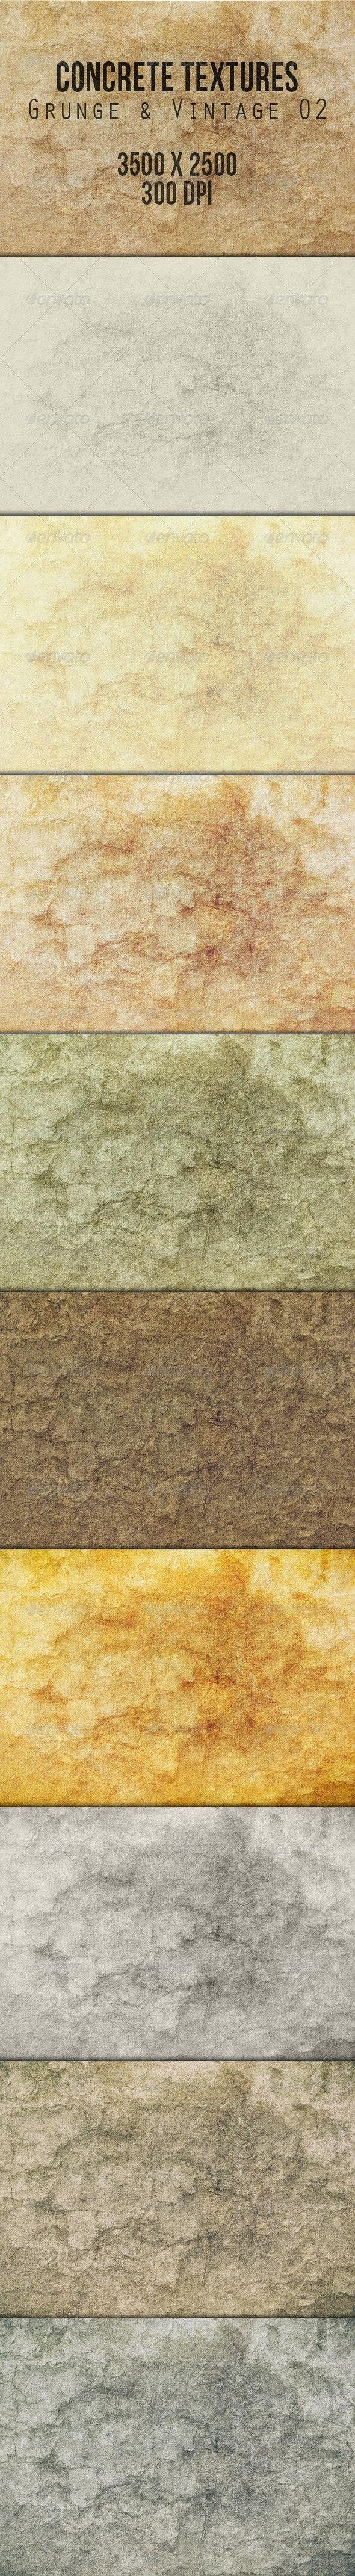 Concrete Textures - Grunge & Vintage 02 - Industrial / Grunge Textures